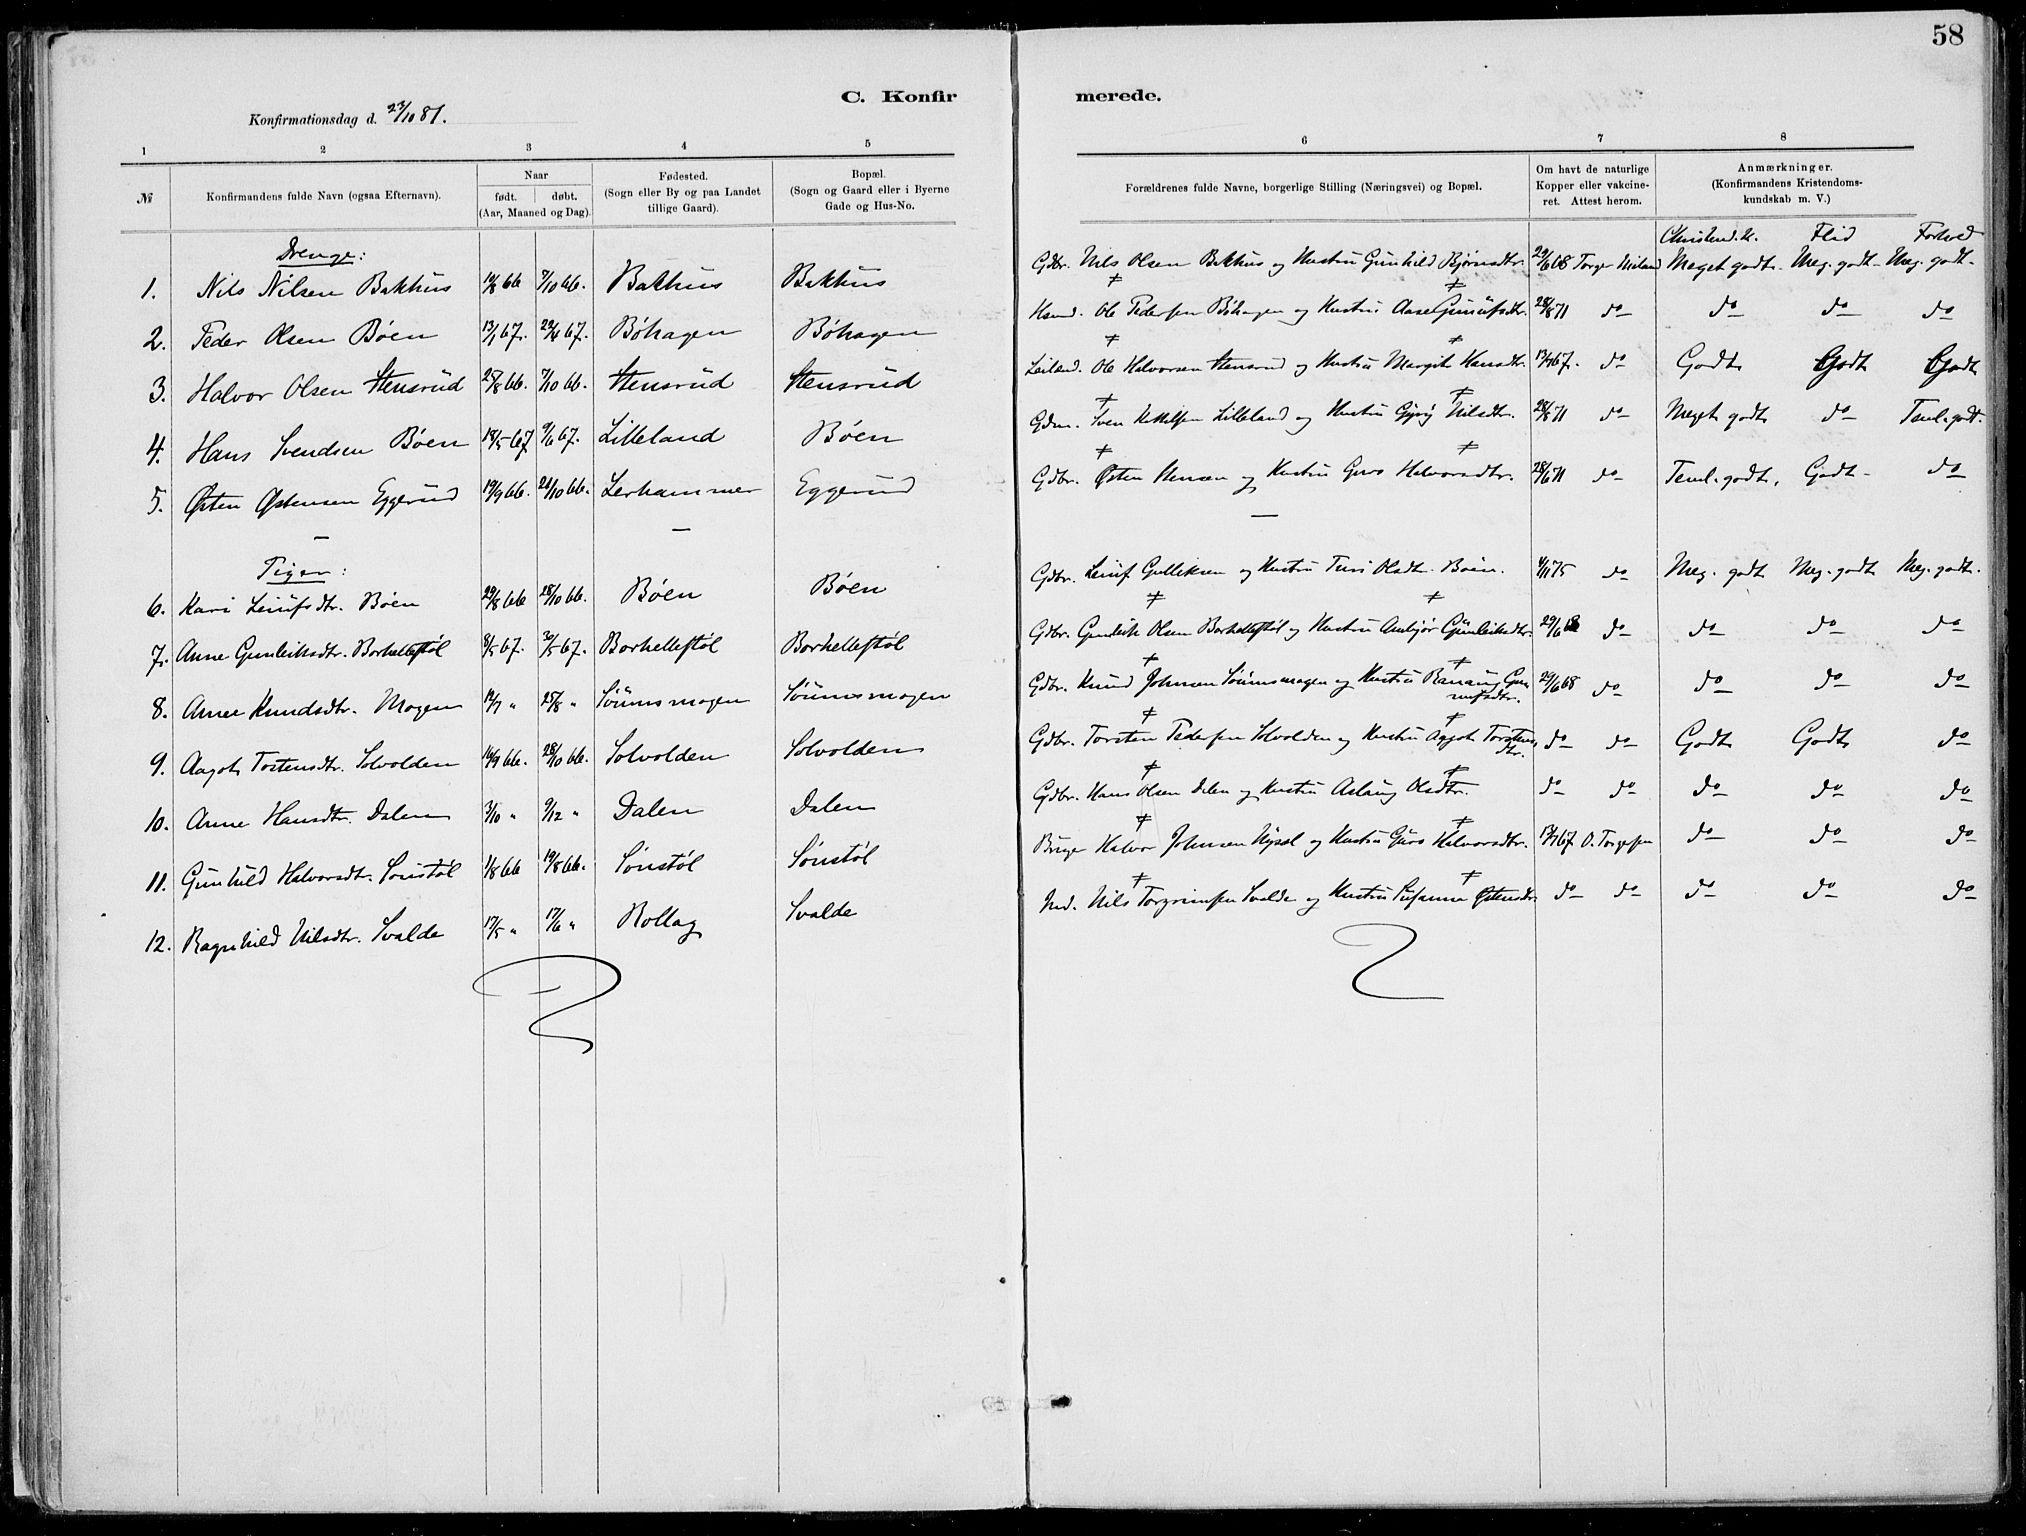 SAKO, Rjukan kirkebøker, F/Fa/L0001: Ministerialbok nr. 1, 1878-1912, s. 58